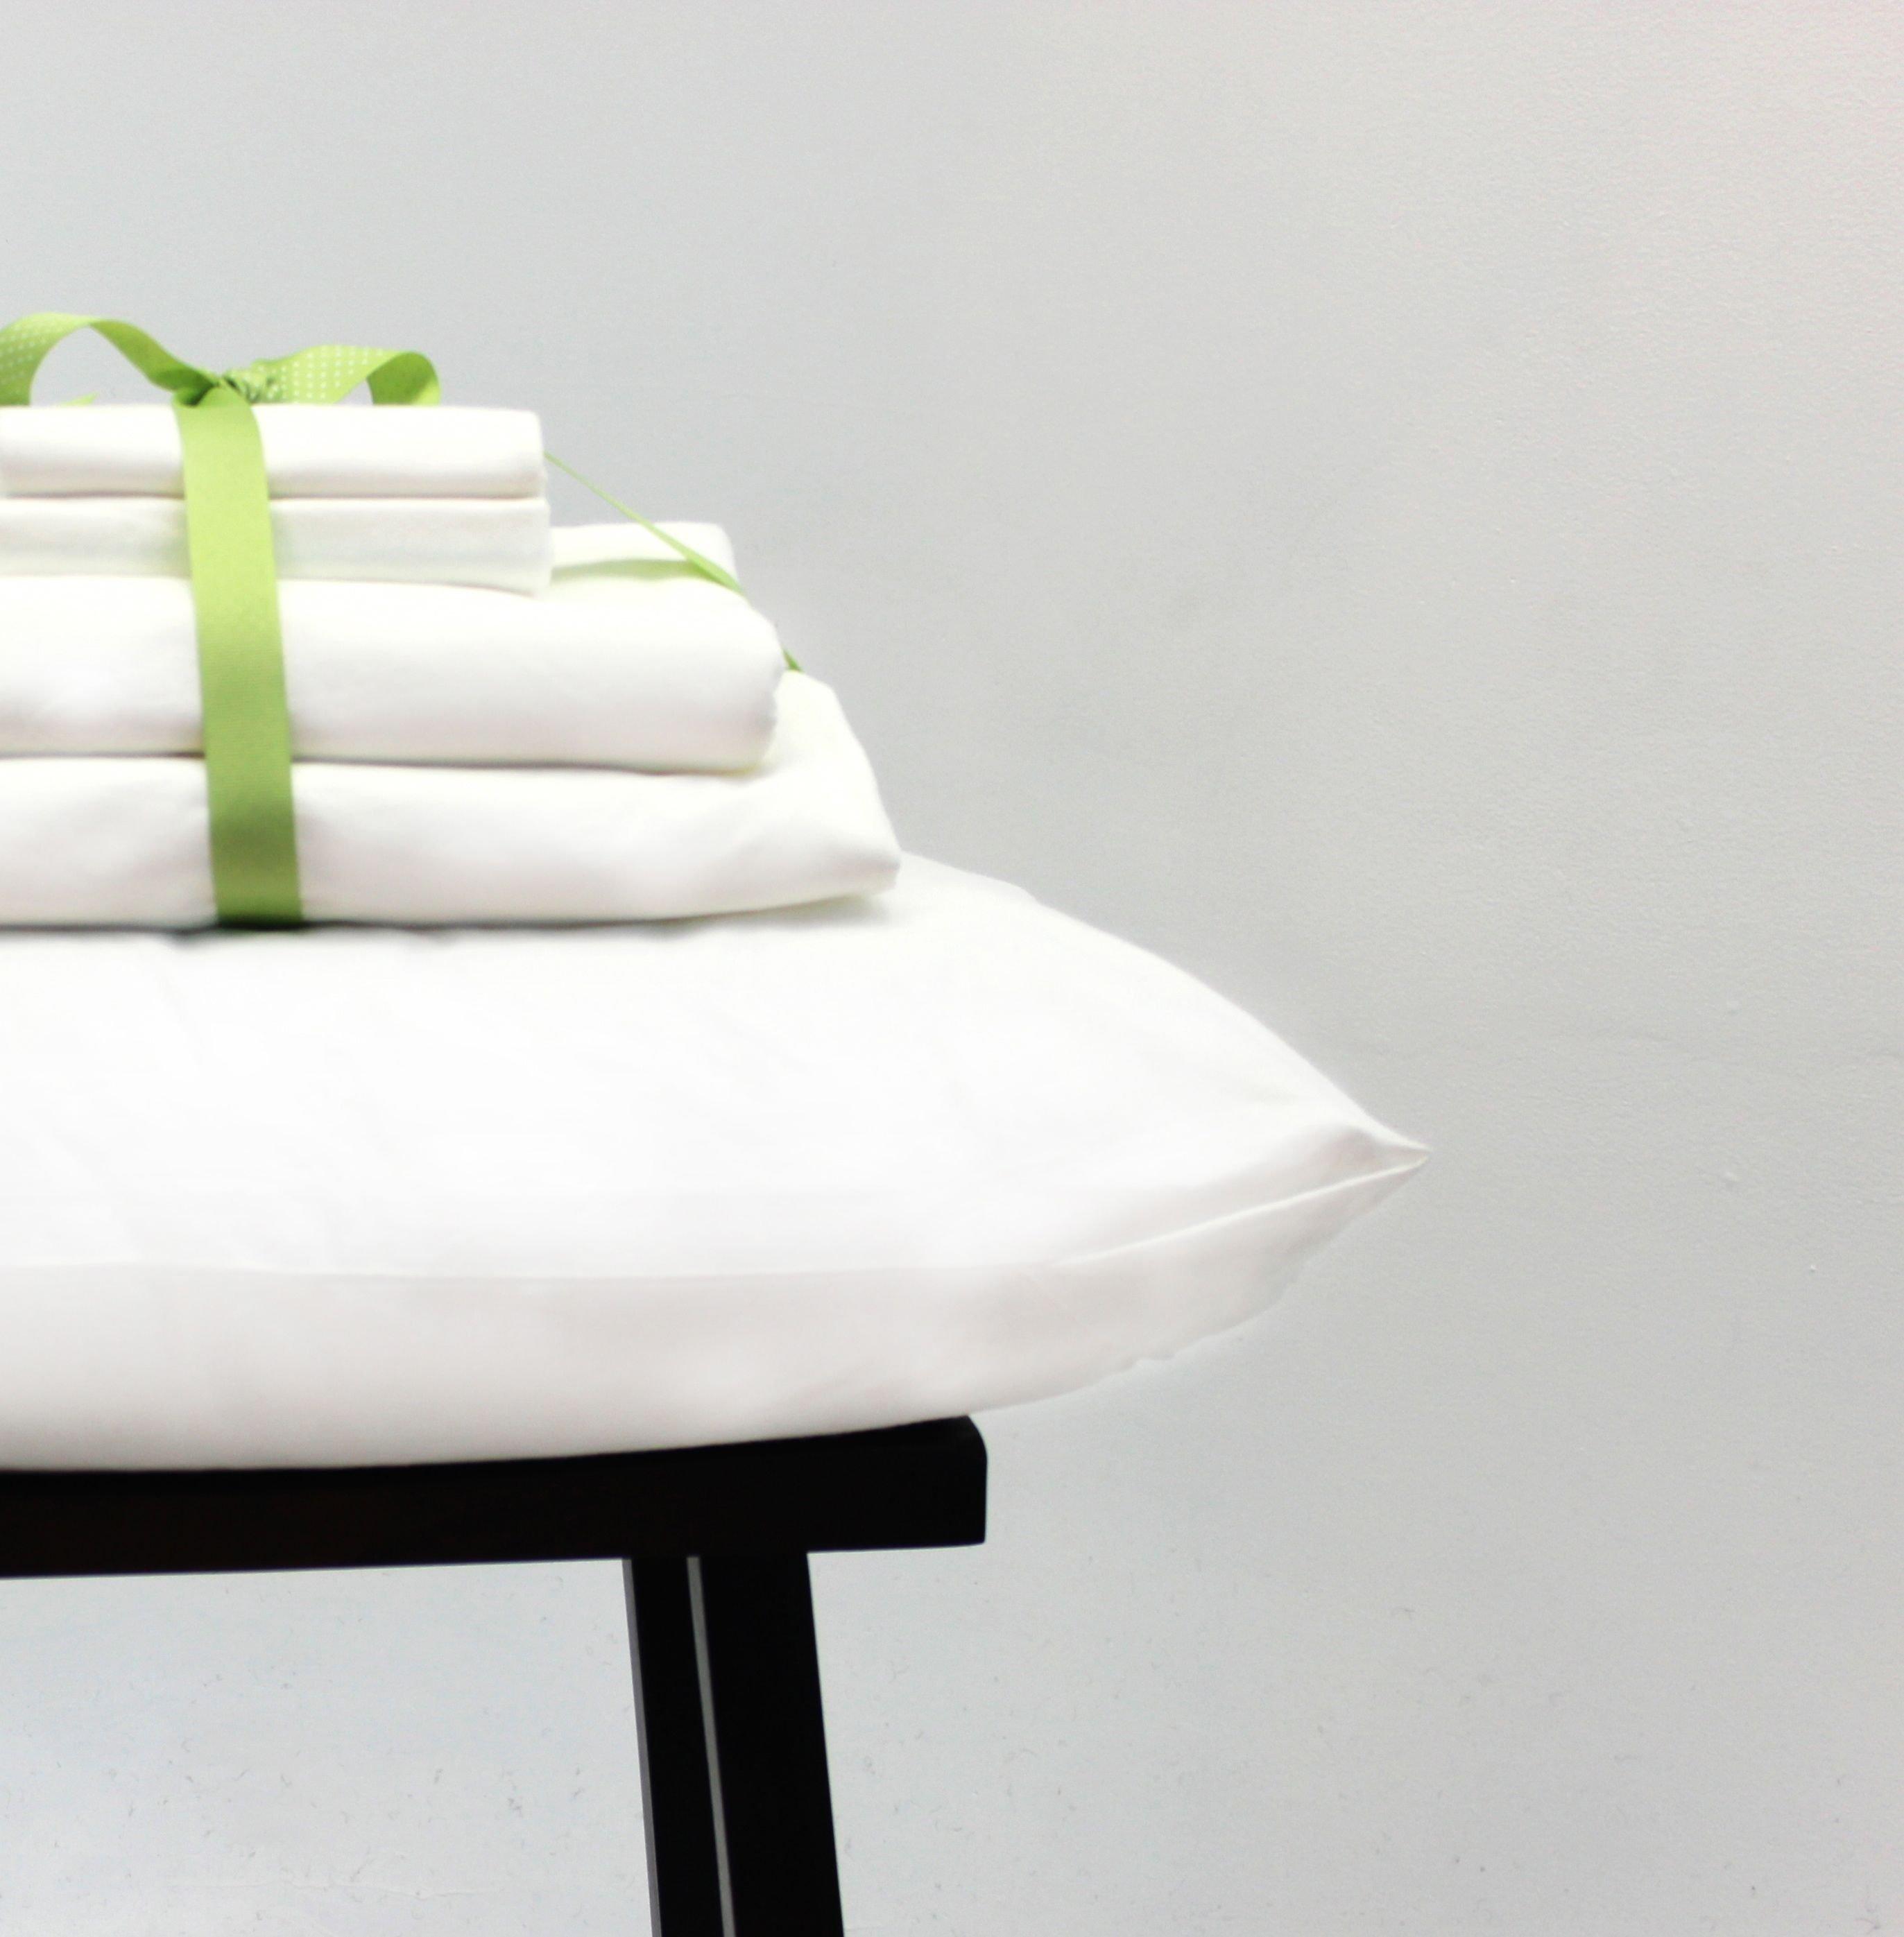 pillow_sheets_stool6 copy